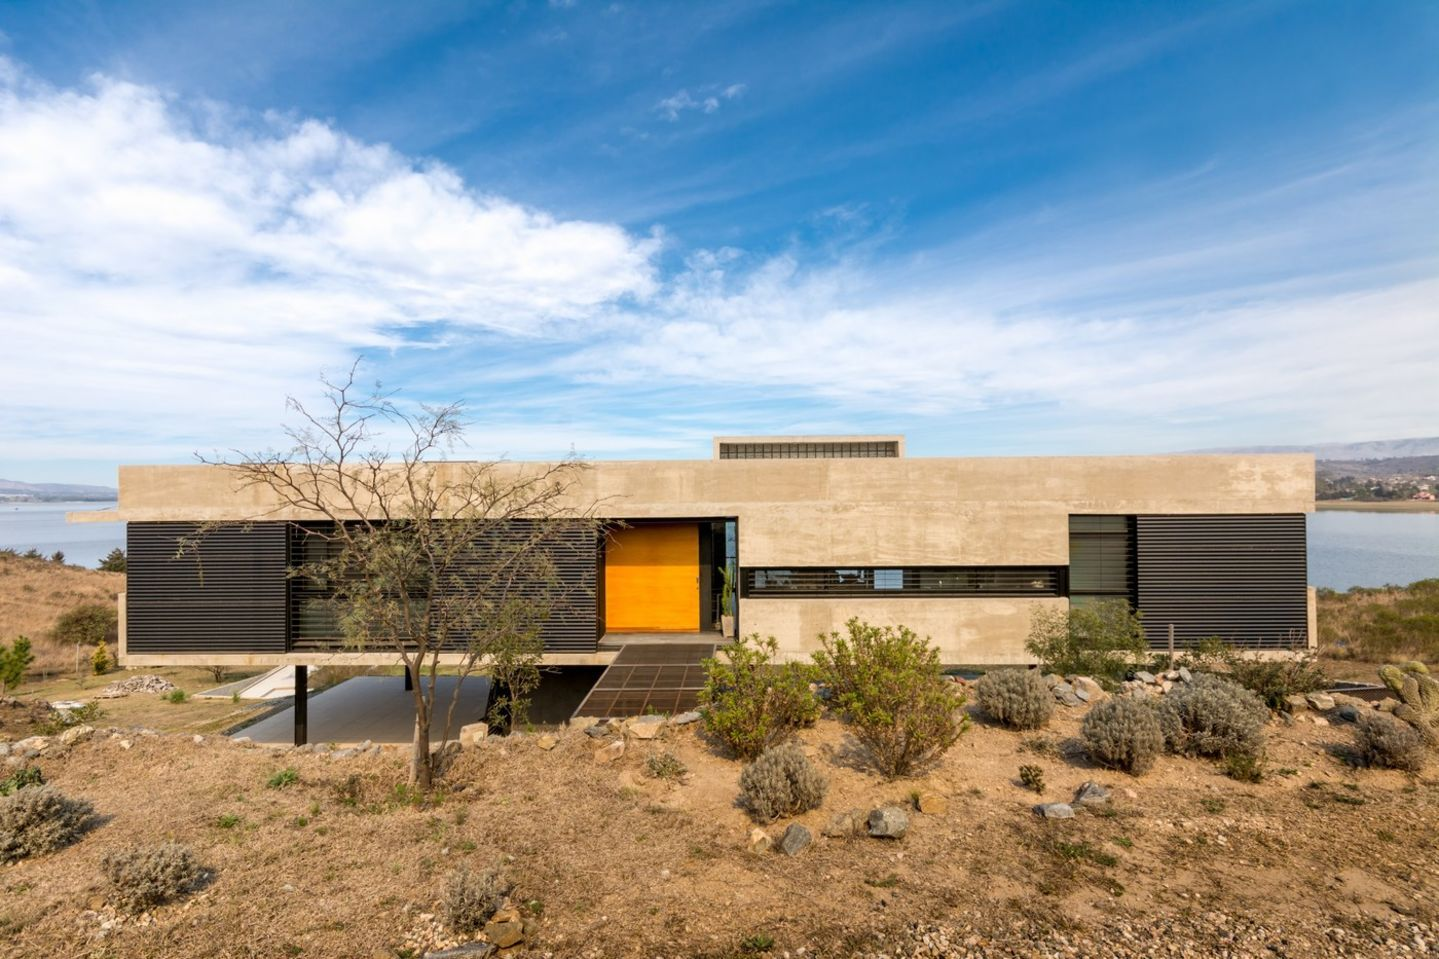 Lake House in Los Molinos, Argentina/ TECTUM Architecture, photo ...